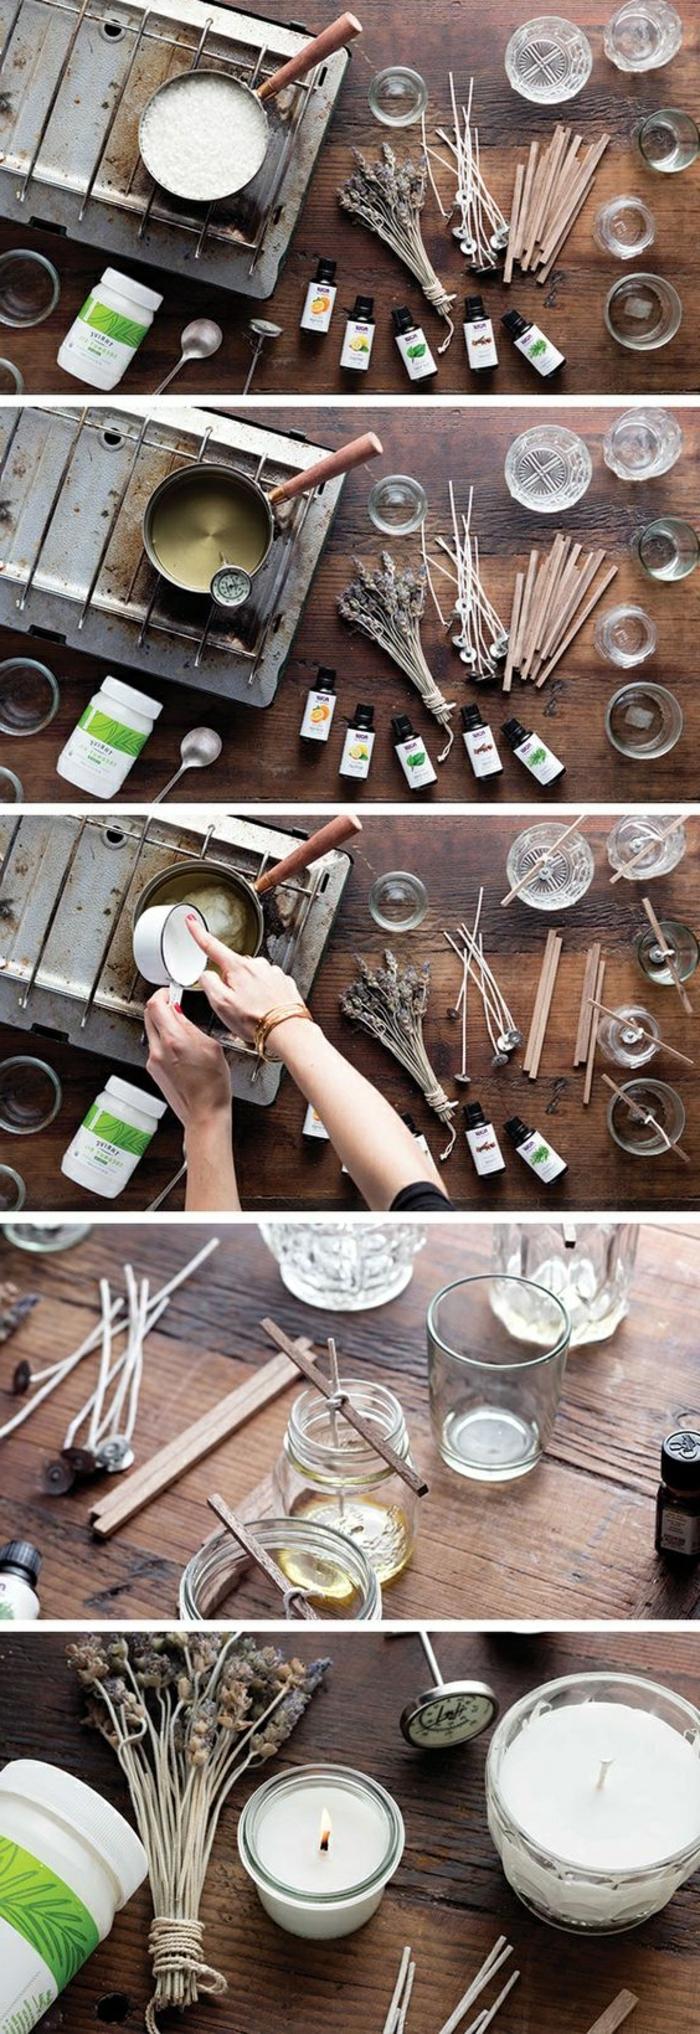 duftkerzen selber machen, weiße, runde diy kerze